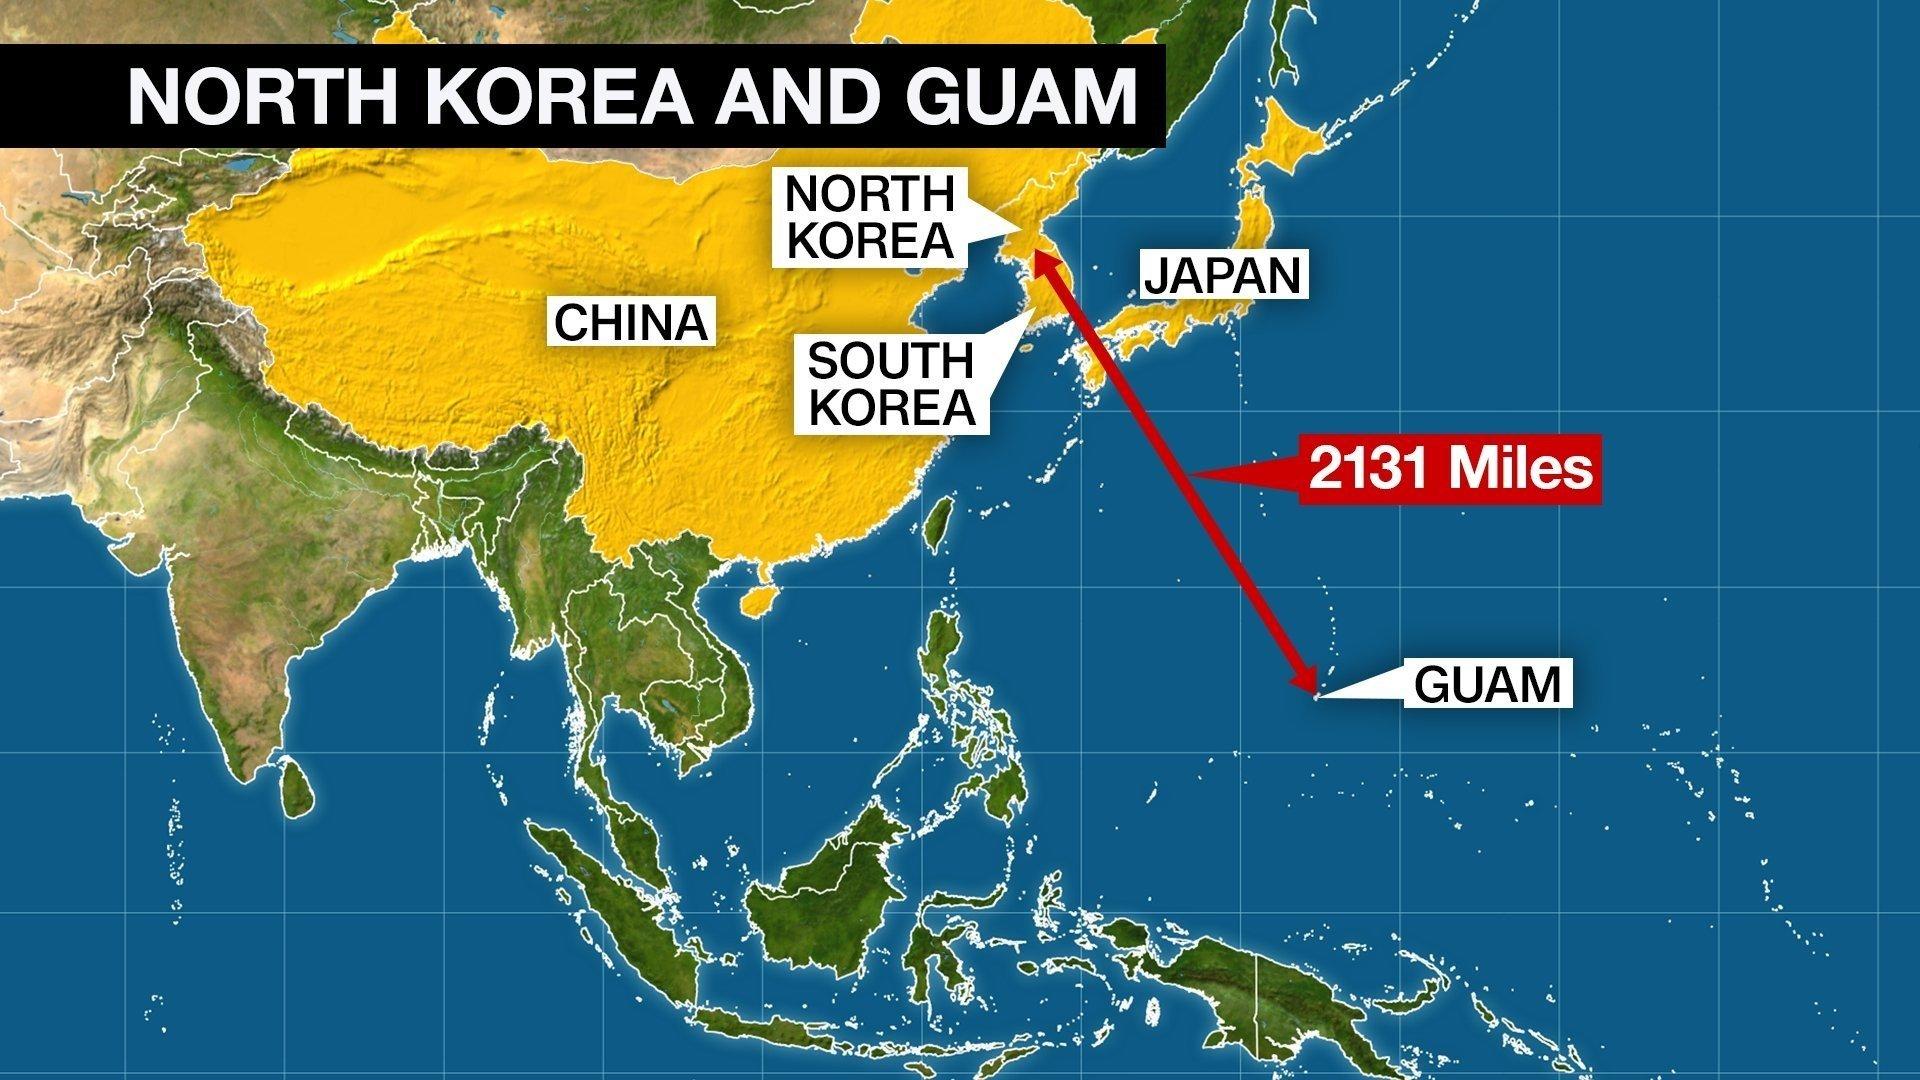 Japan to install land-based missile defense Aegis Ashore